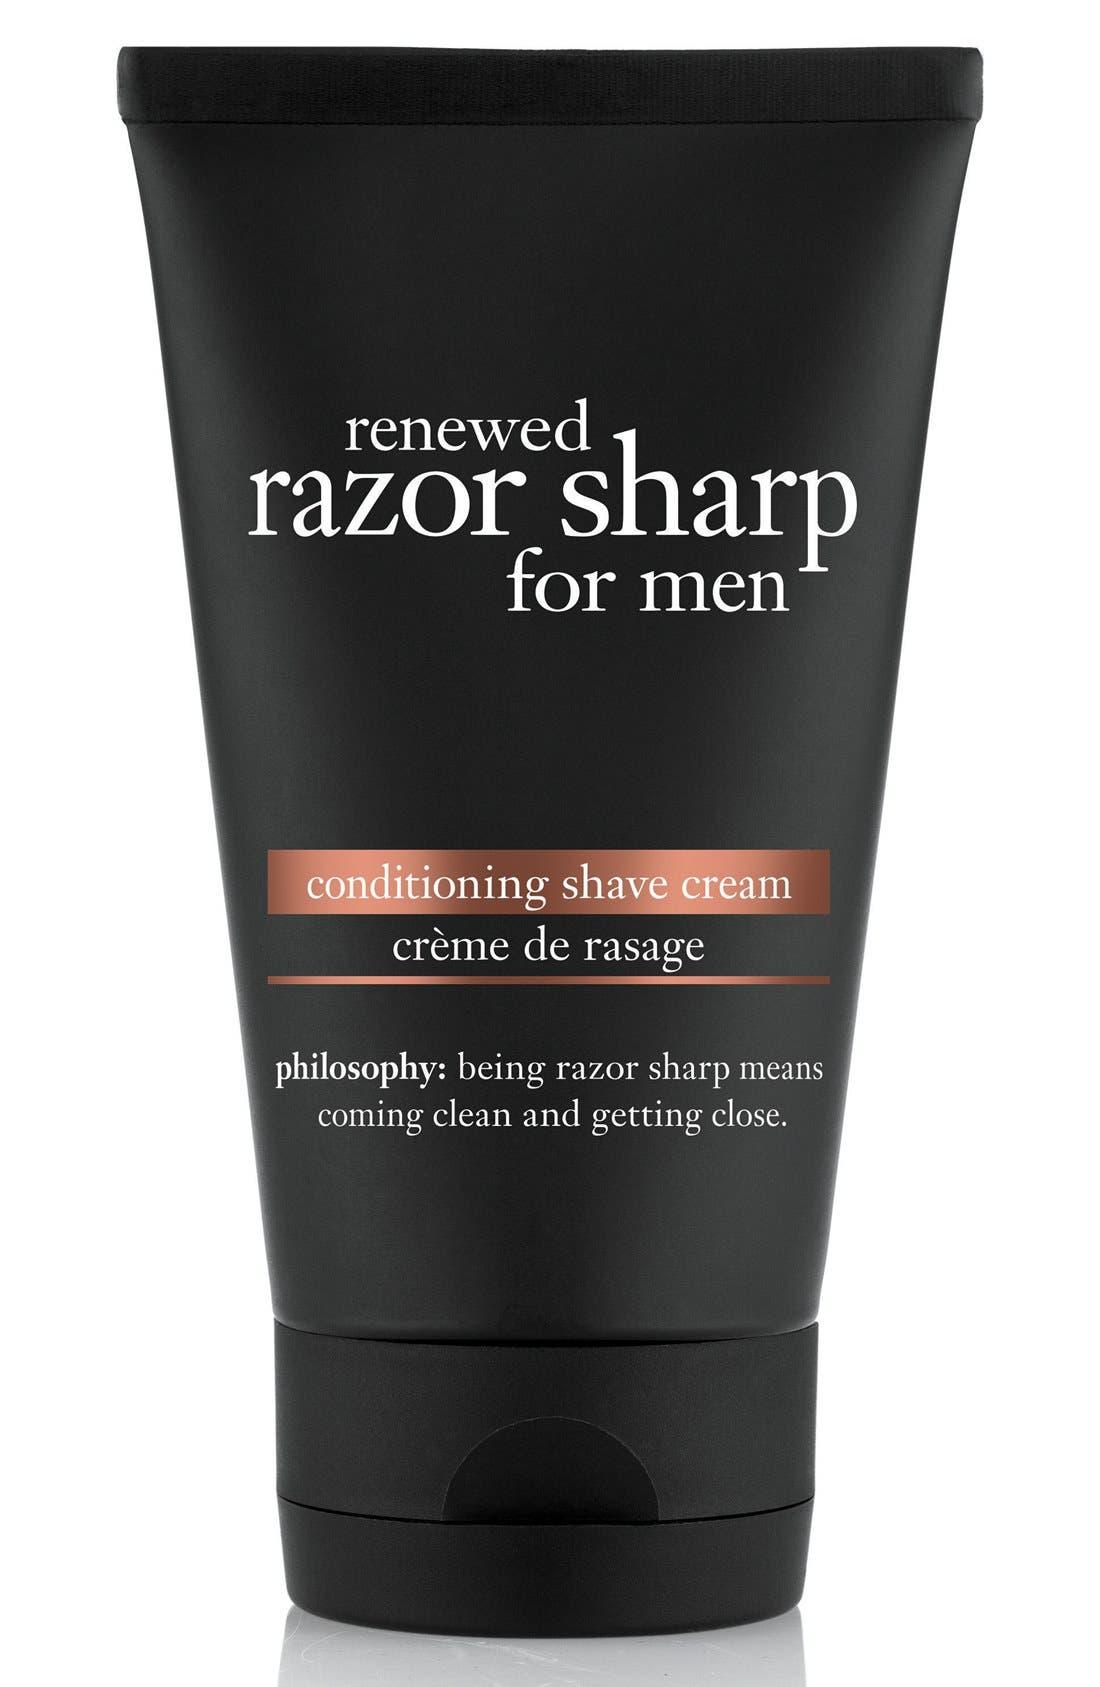 philosophy 'renewed razor sharp' cleansing shave cream for men